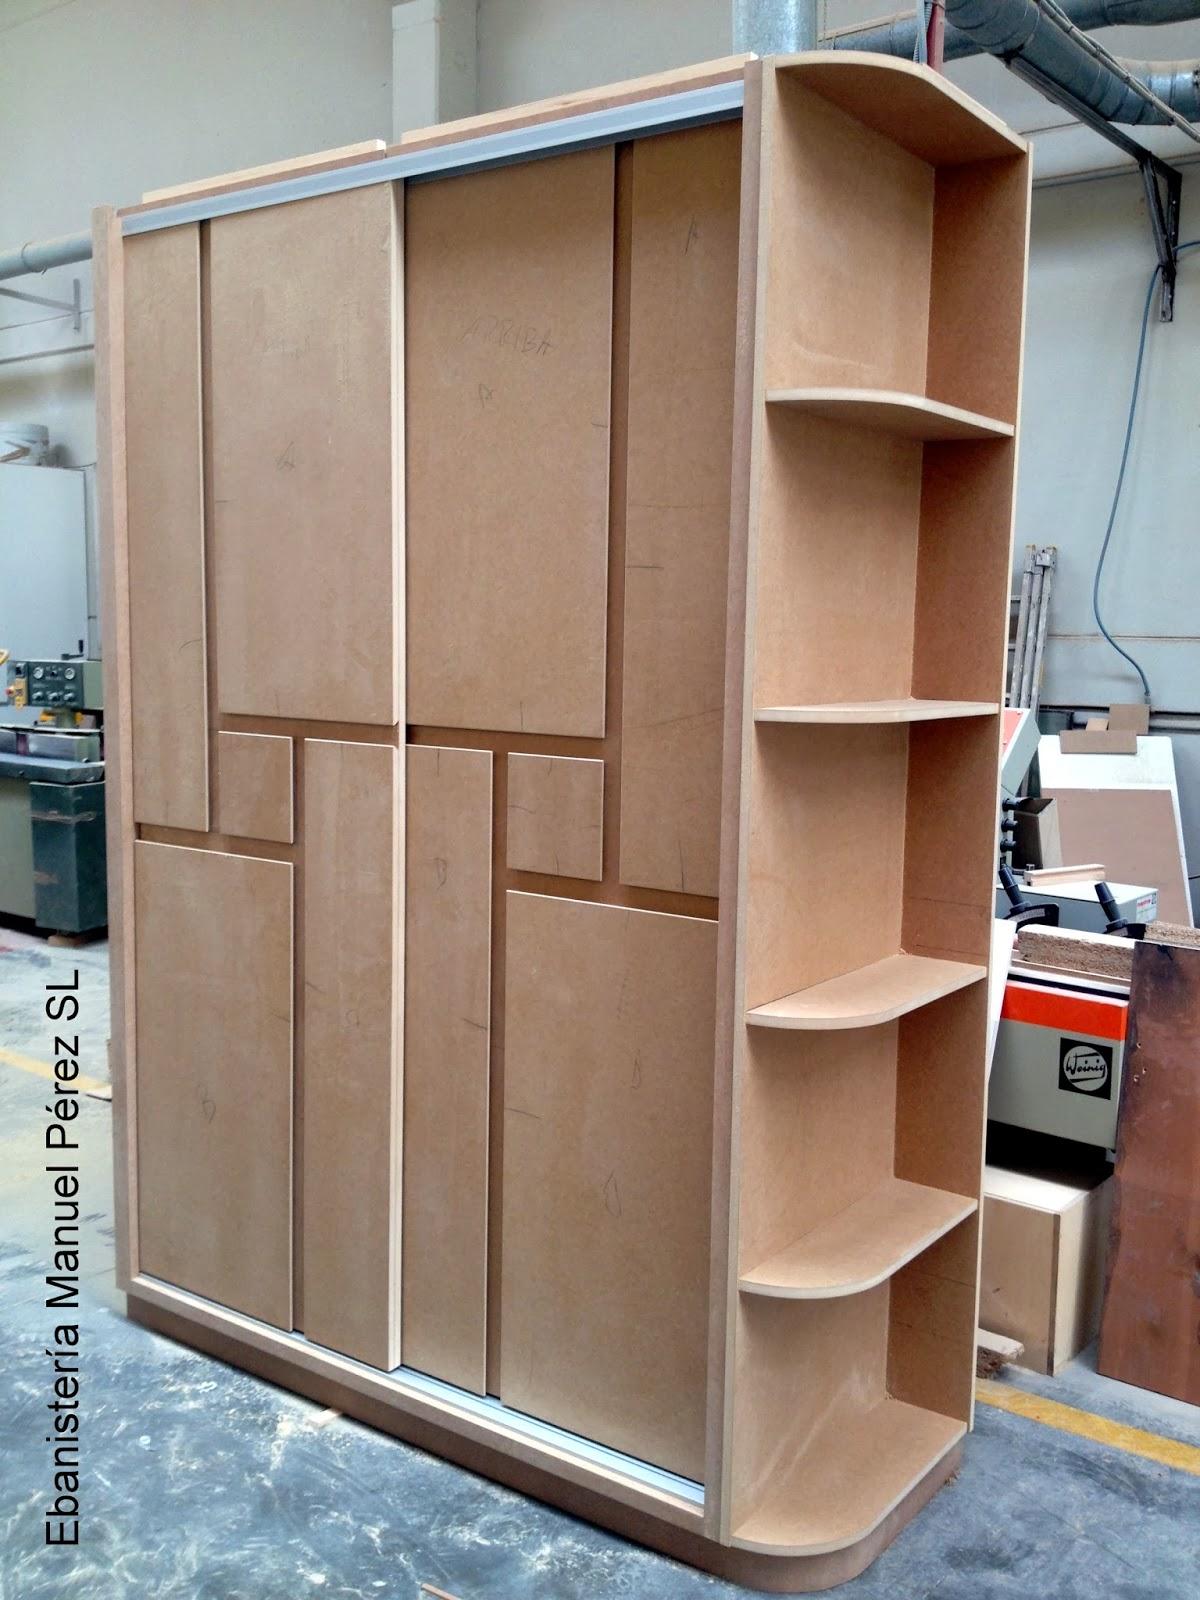 Ebanisteria carpinteria manuel perez zaragoza armario for Diseno puerta